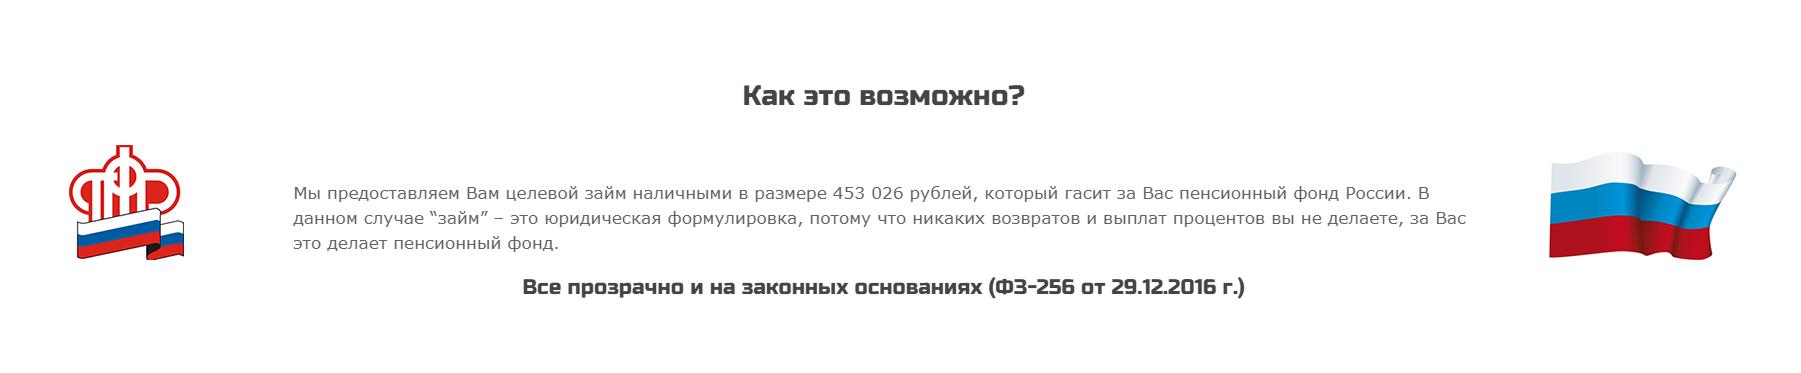 http://joxi.ru/p27RJvQtoeB0om